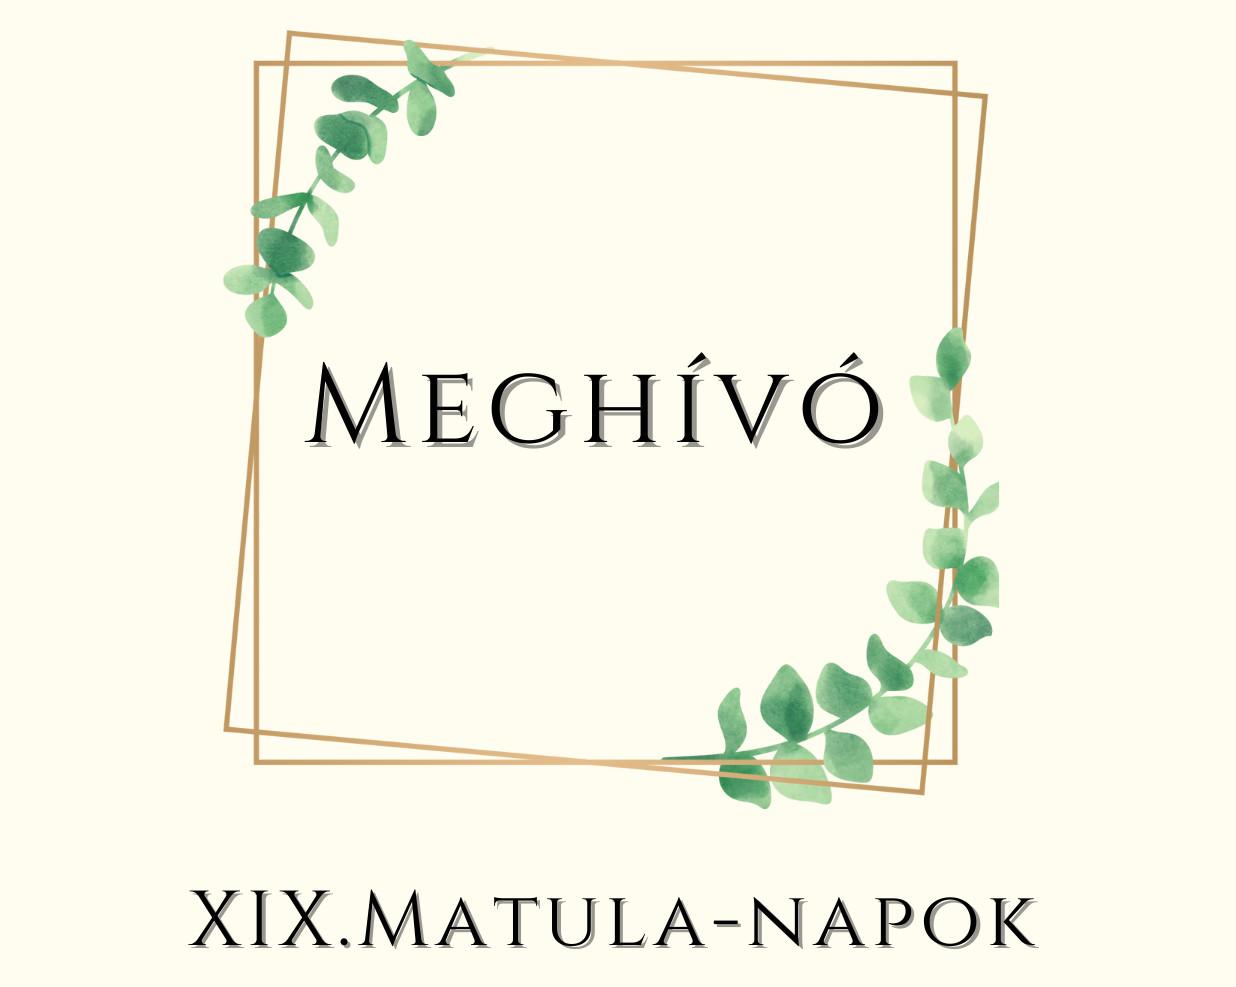 Matula_napok_XIX_1236x987